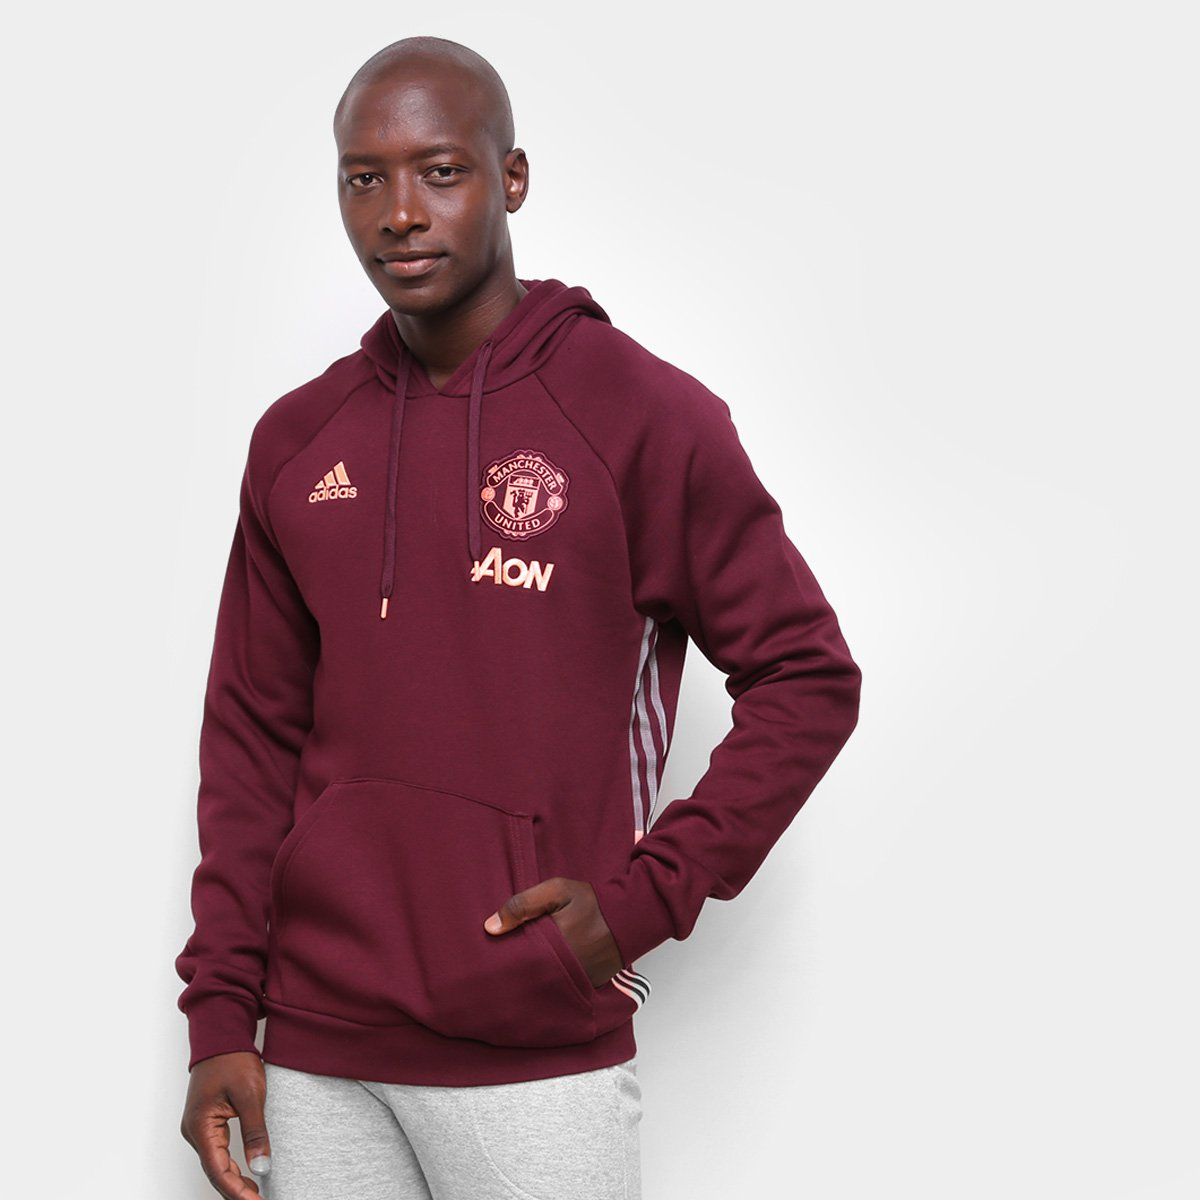 Moletom Manchester United Adidas 21/22 Masculino